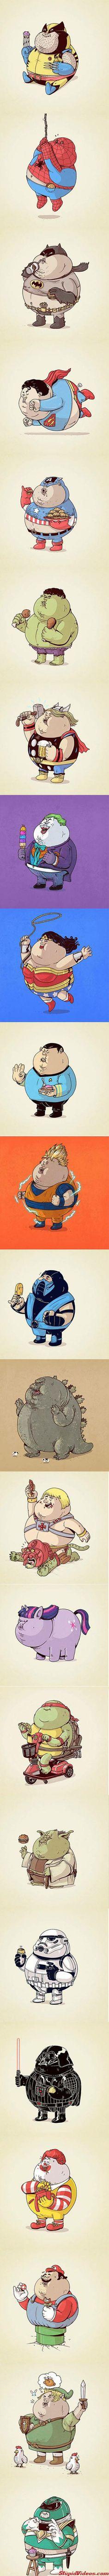 Americanized Cartoon Characters